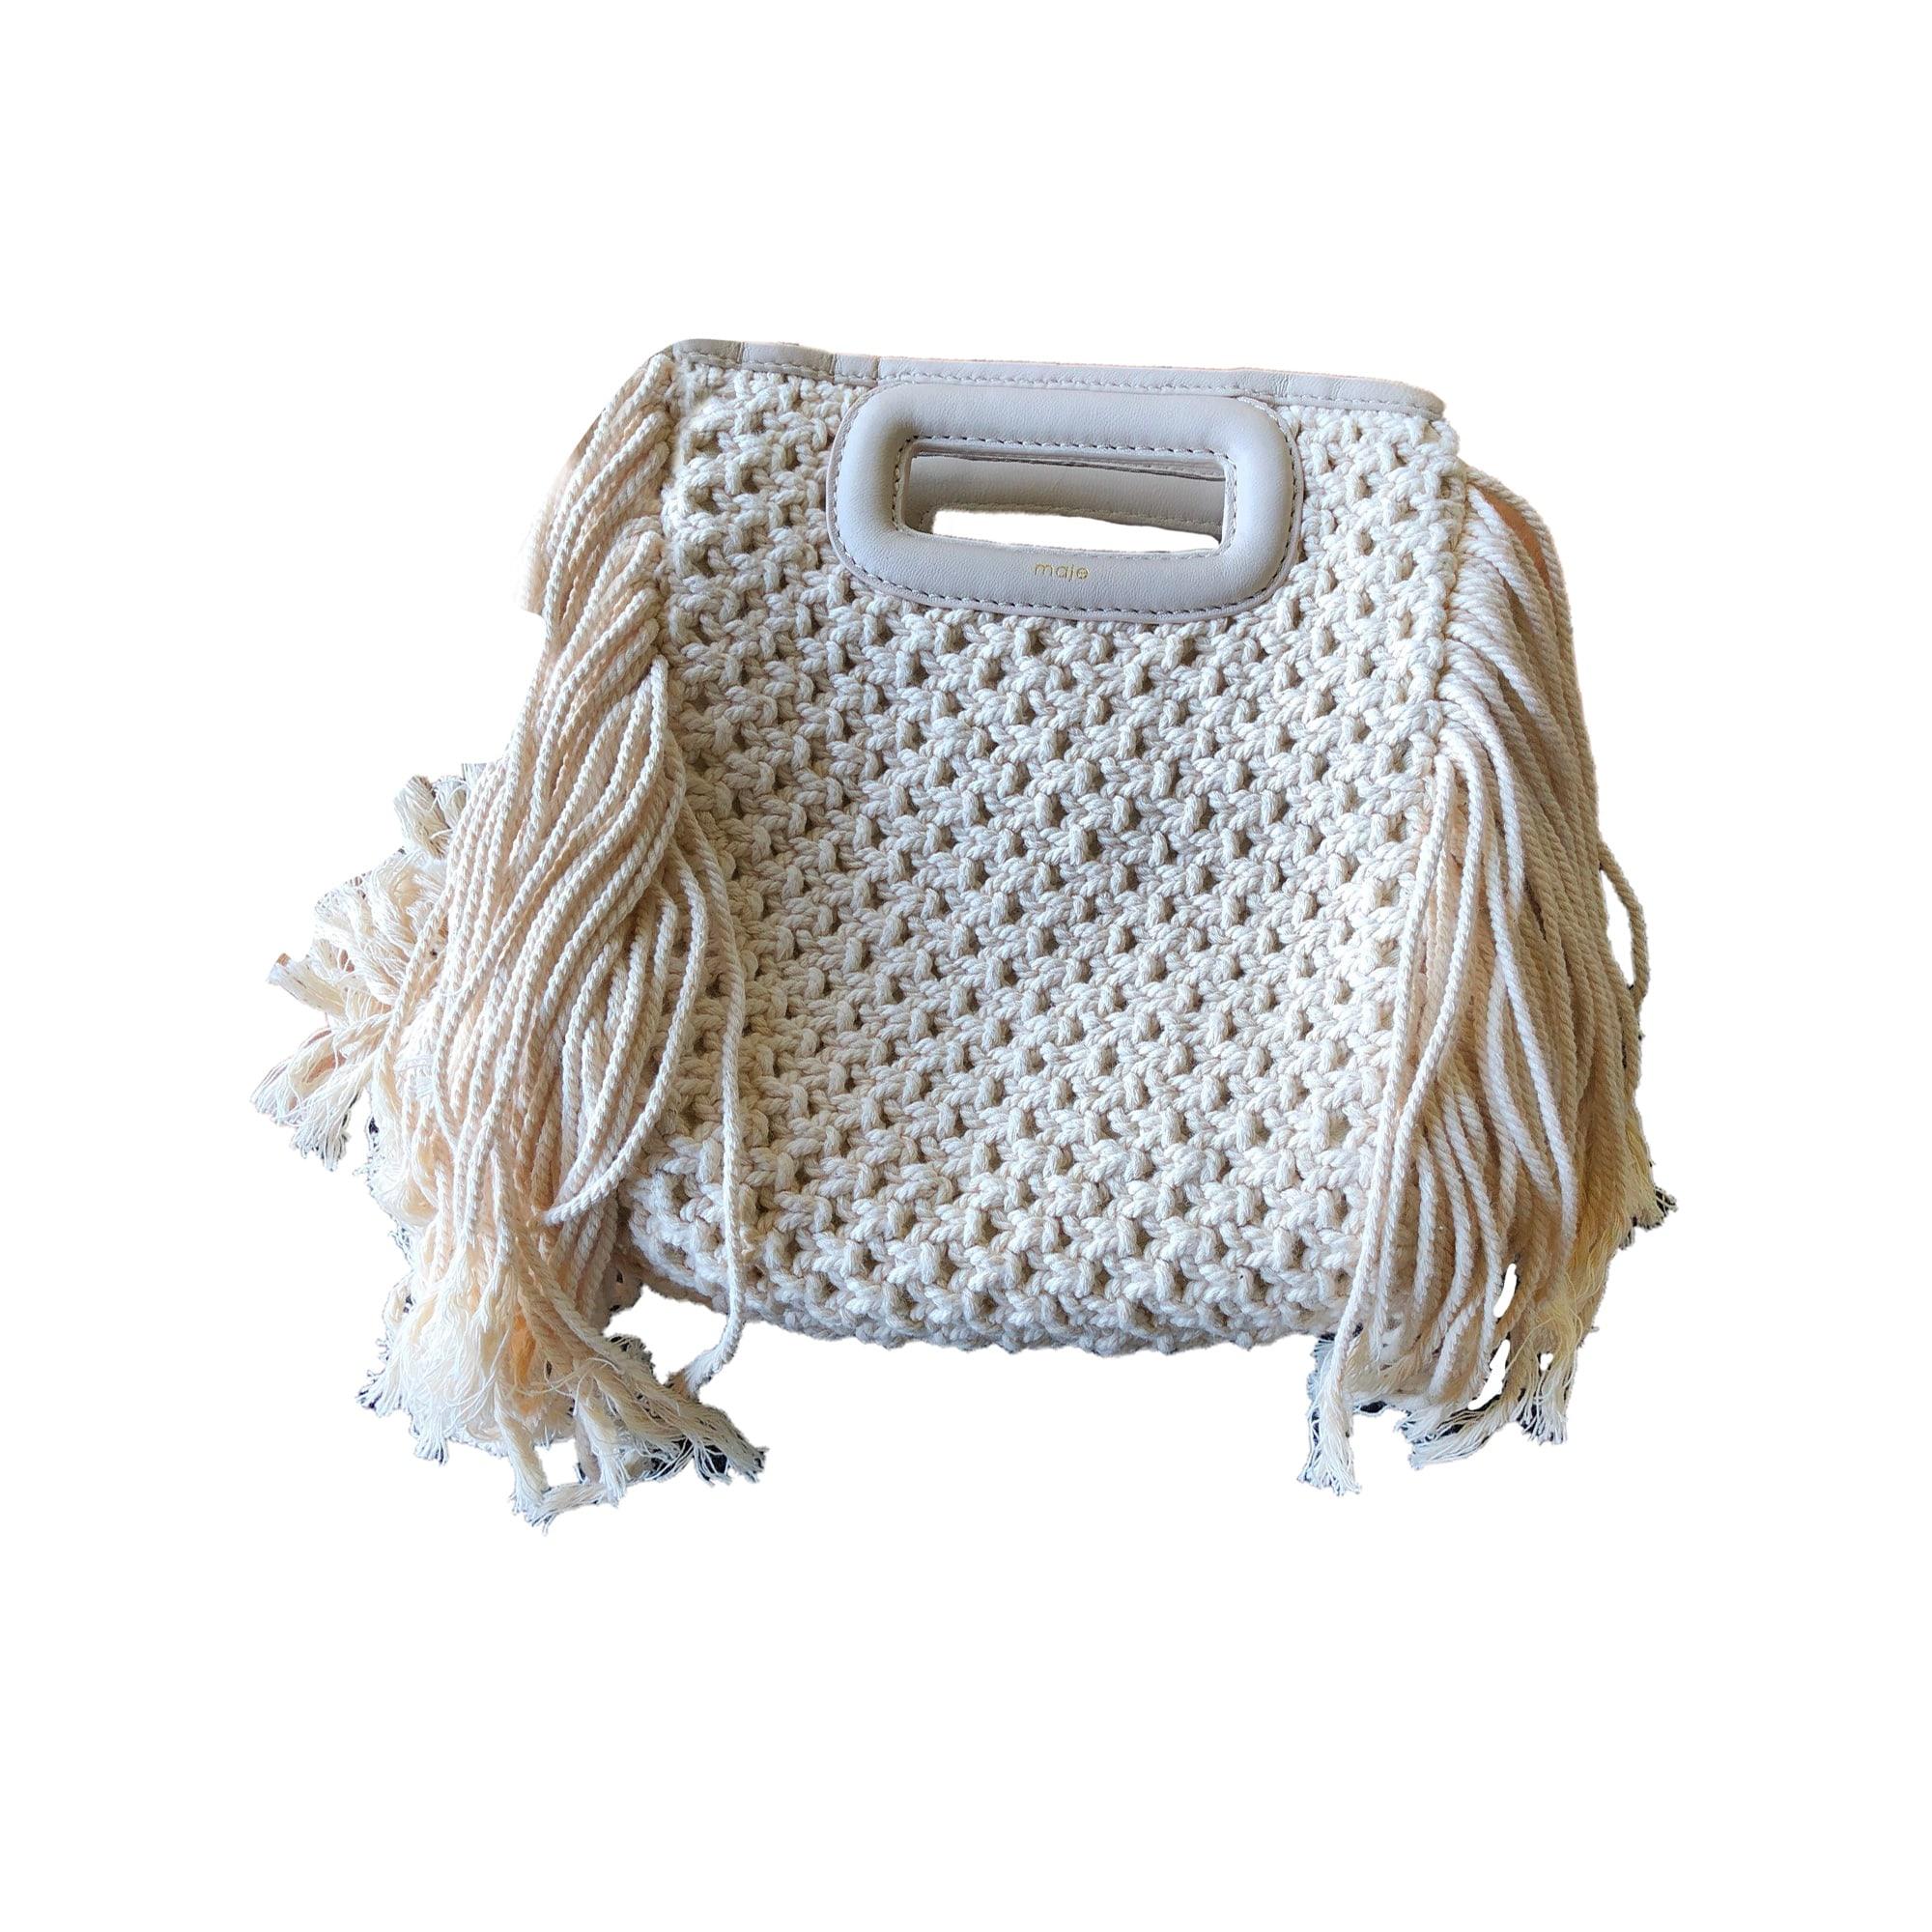 052a2f9f56 Sac en bandoulière en tissu MAJE blanc vendu par Maevawytten - 8084663